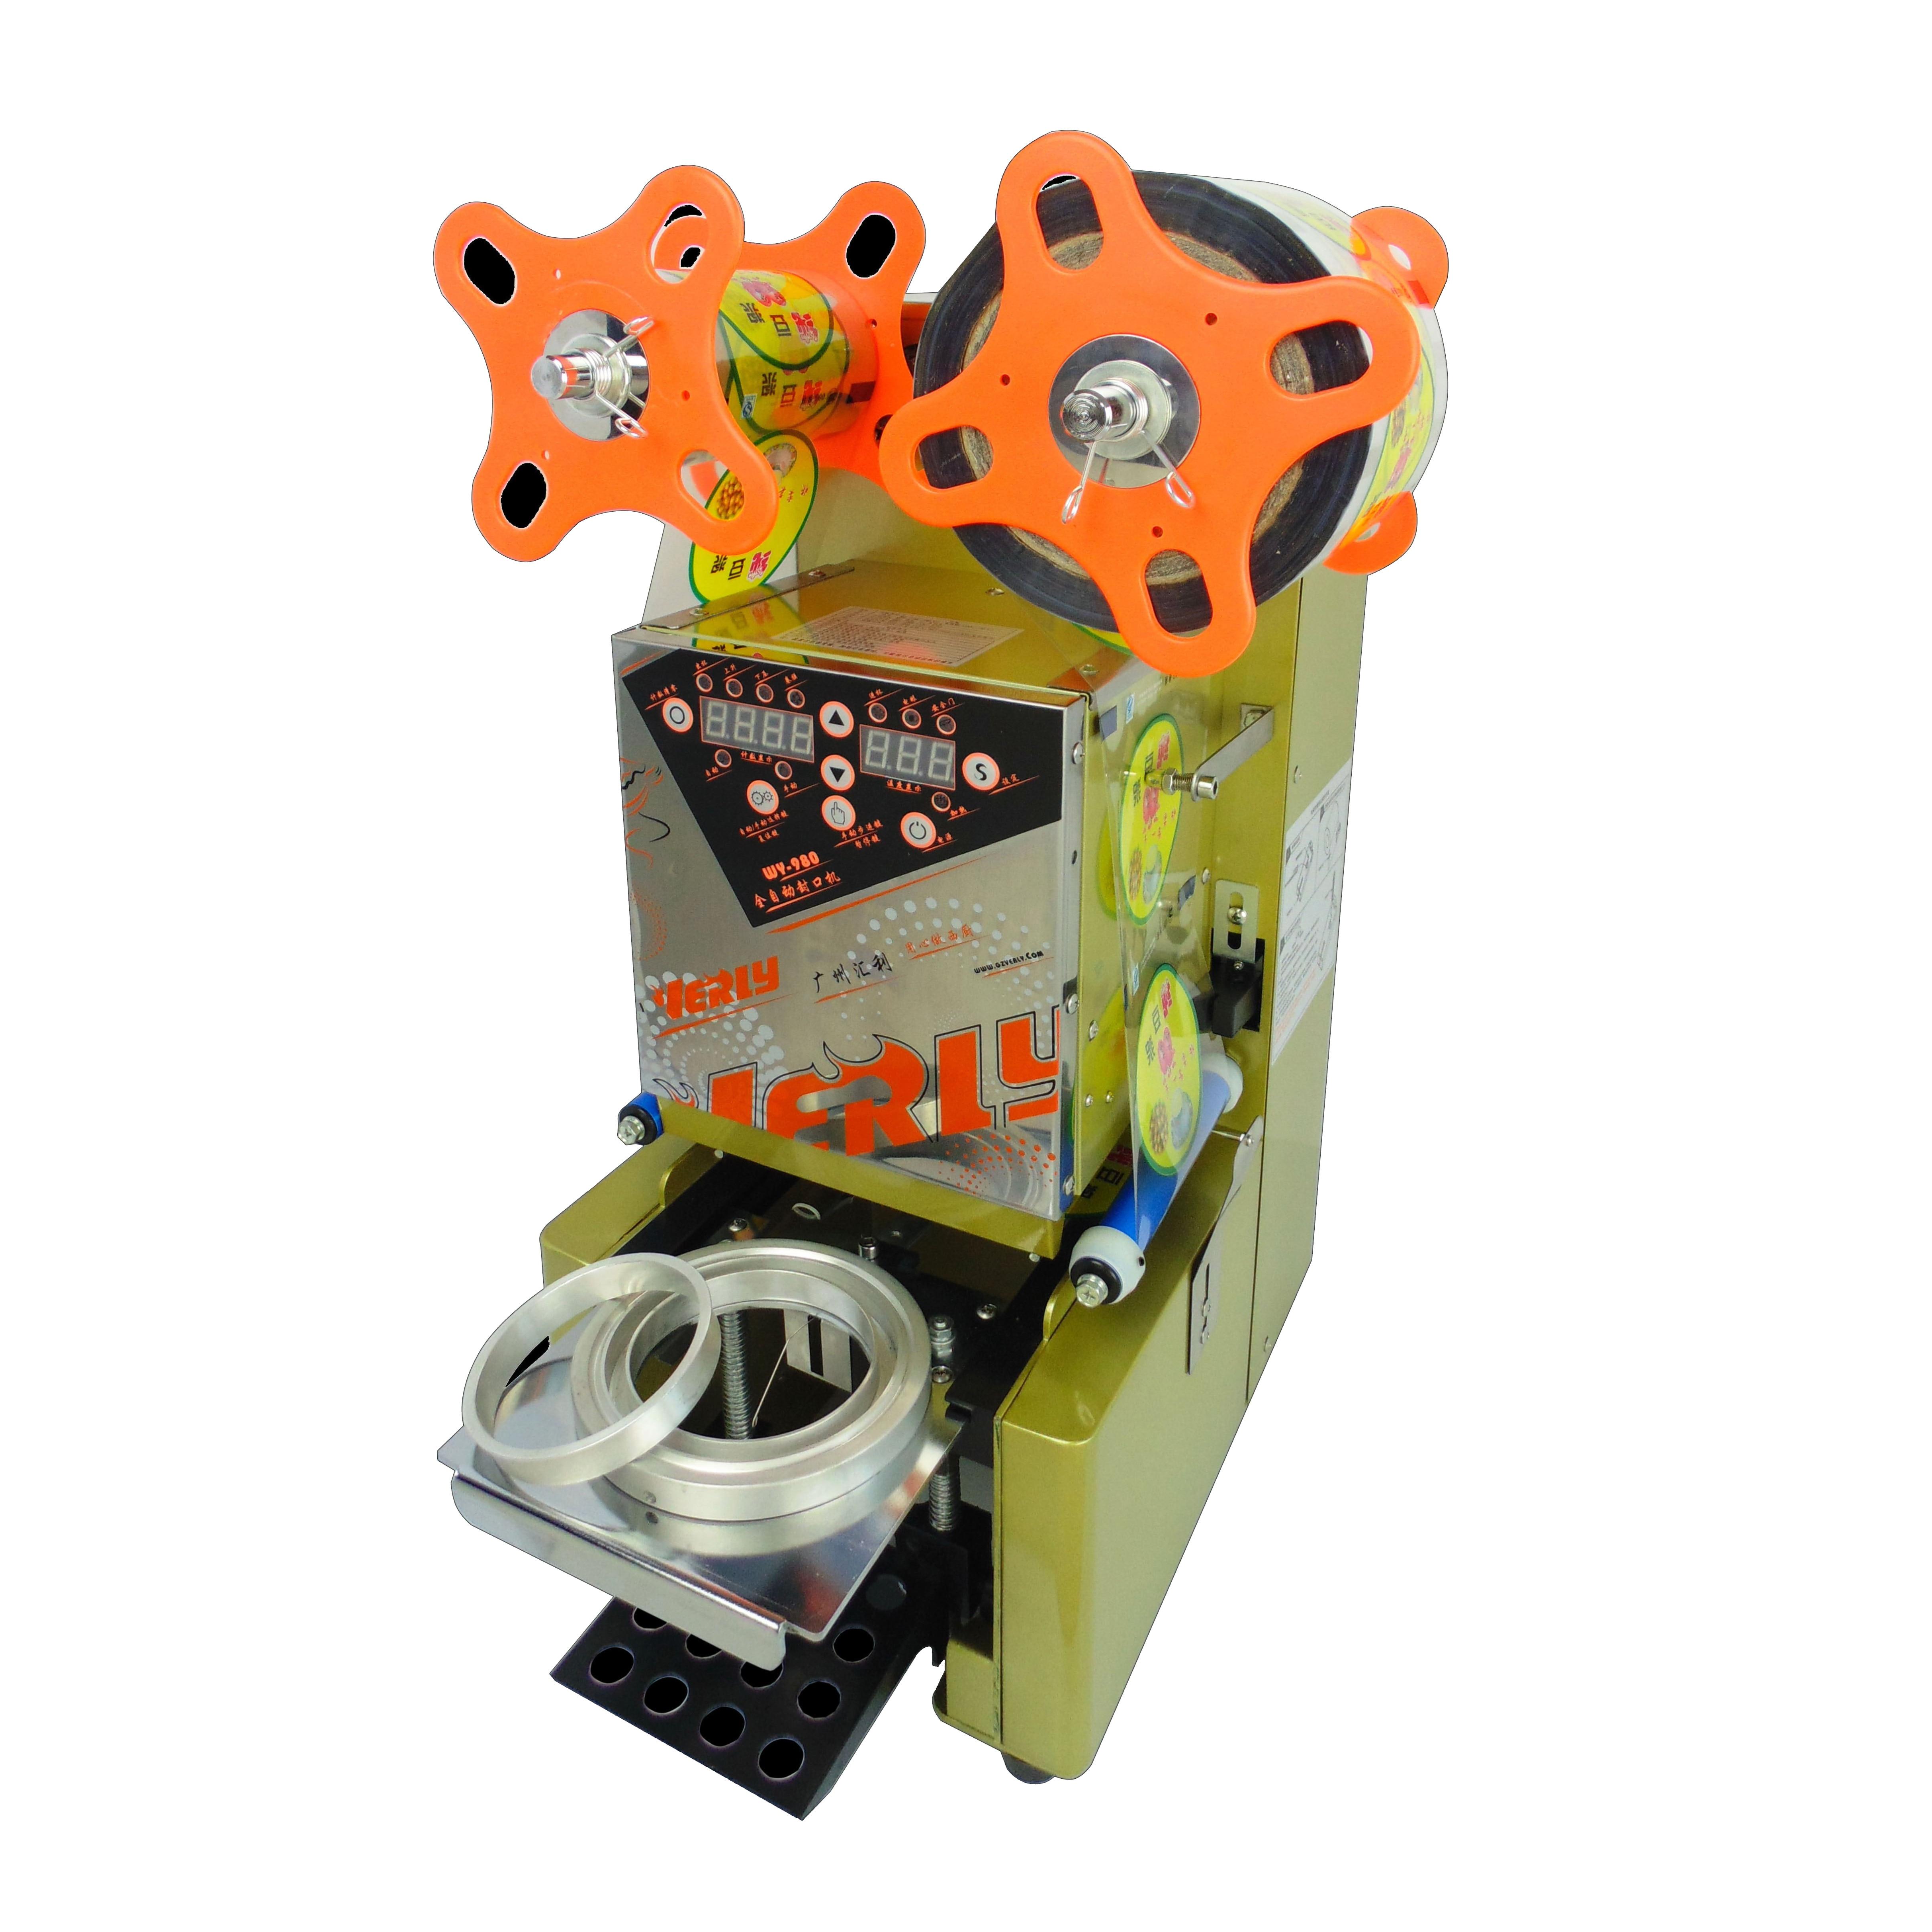 95mm 90mm Semi Automatic plastic cup sealing sealer machine Digital display cup sealer in Vacuum Food Sealers from Home Appliances